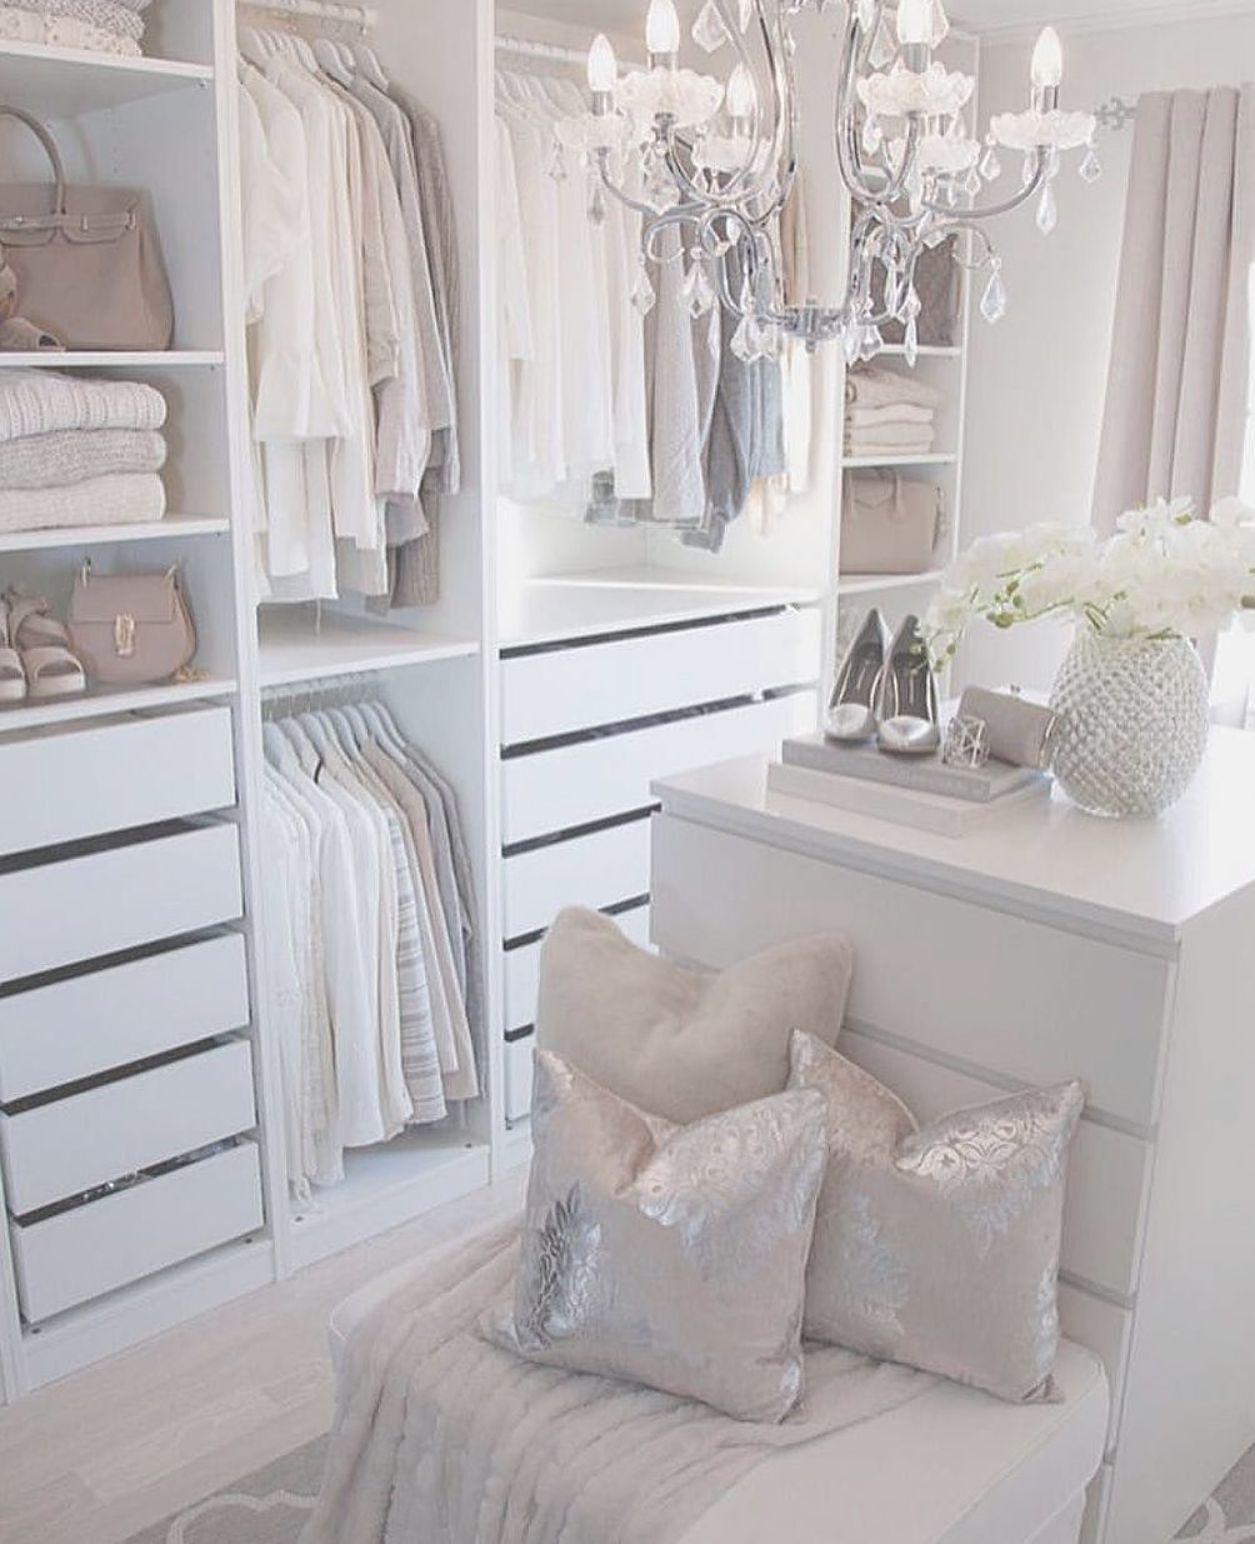 Interior Design Home Decor On Instagram Really Loving